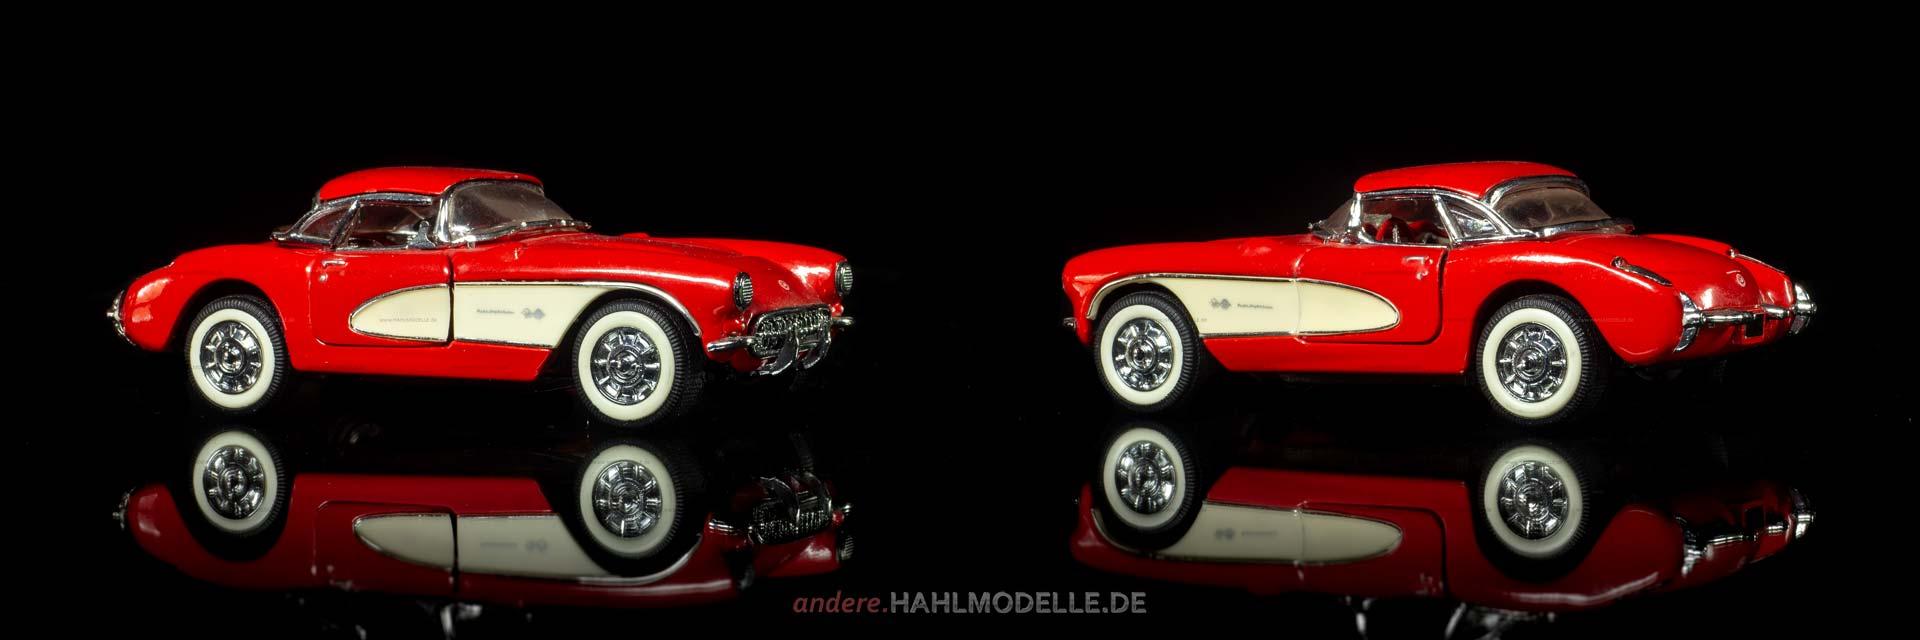 Chevrolet Corvette C1 | Roadster | Franklin Mint Precision Models | 1:43 | www.andere.hahlmodelle.de